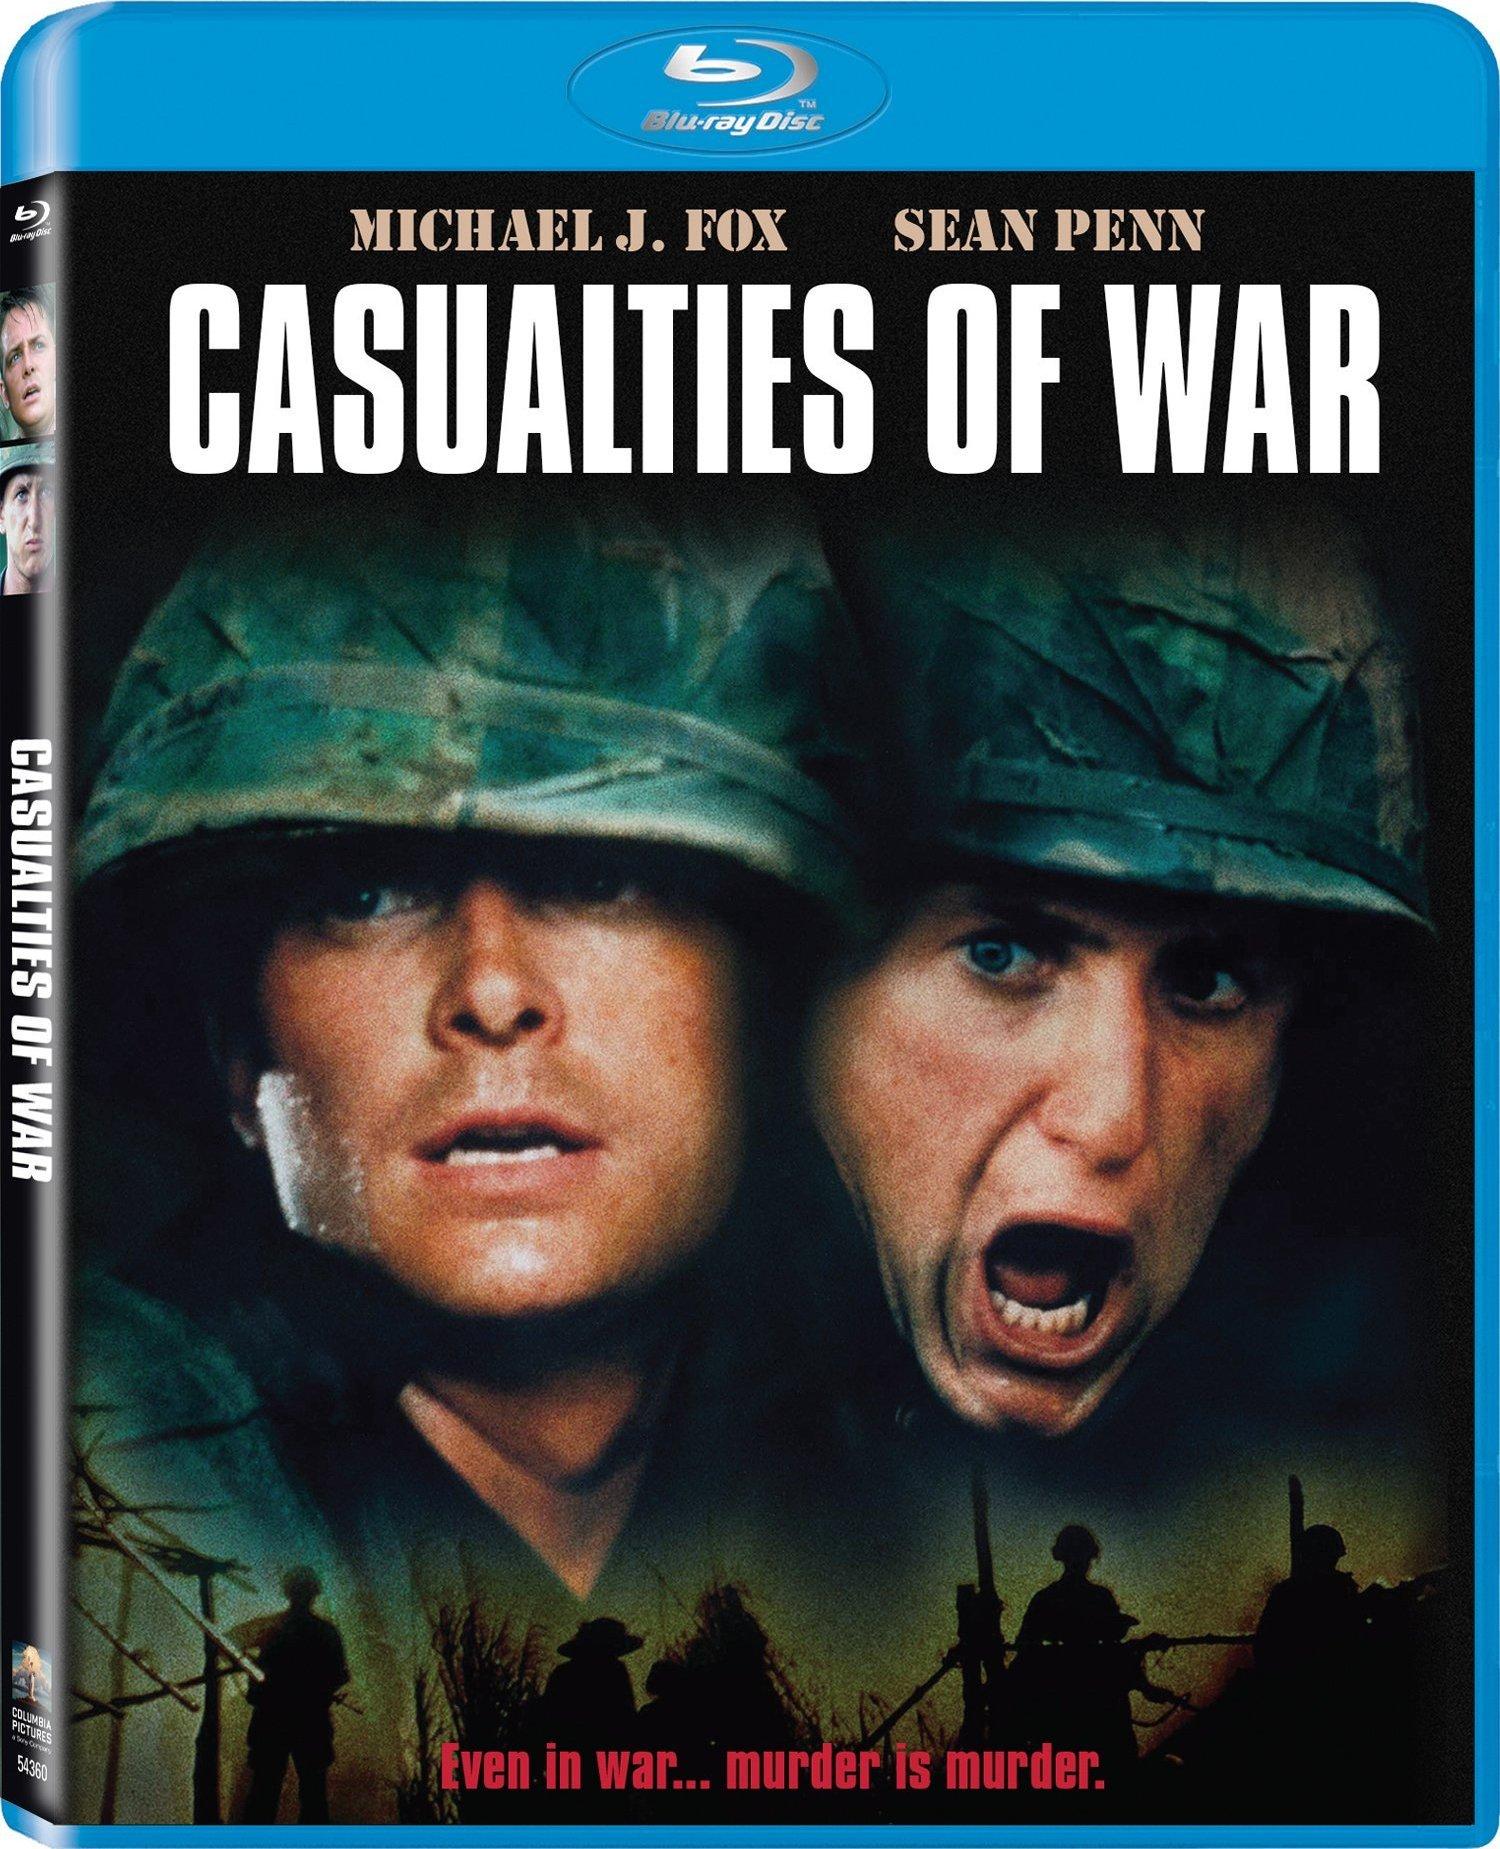 Casualties of War (1989) Blu-ray